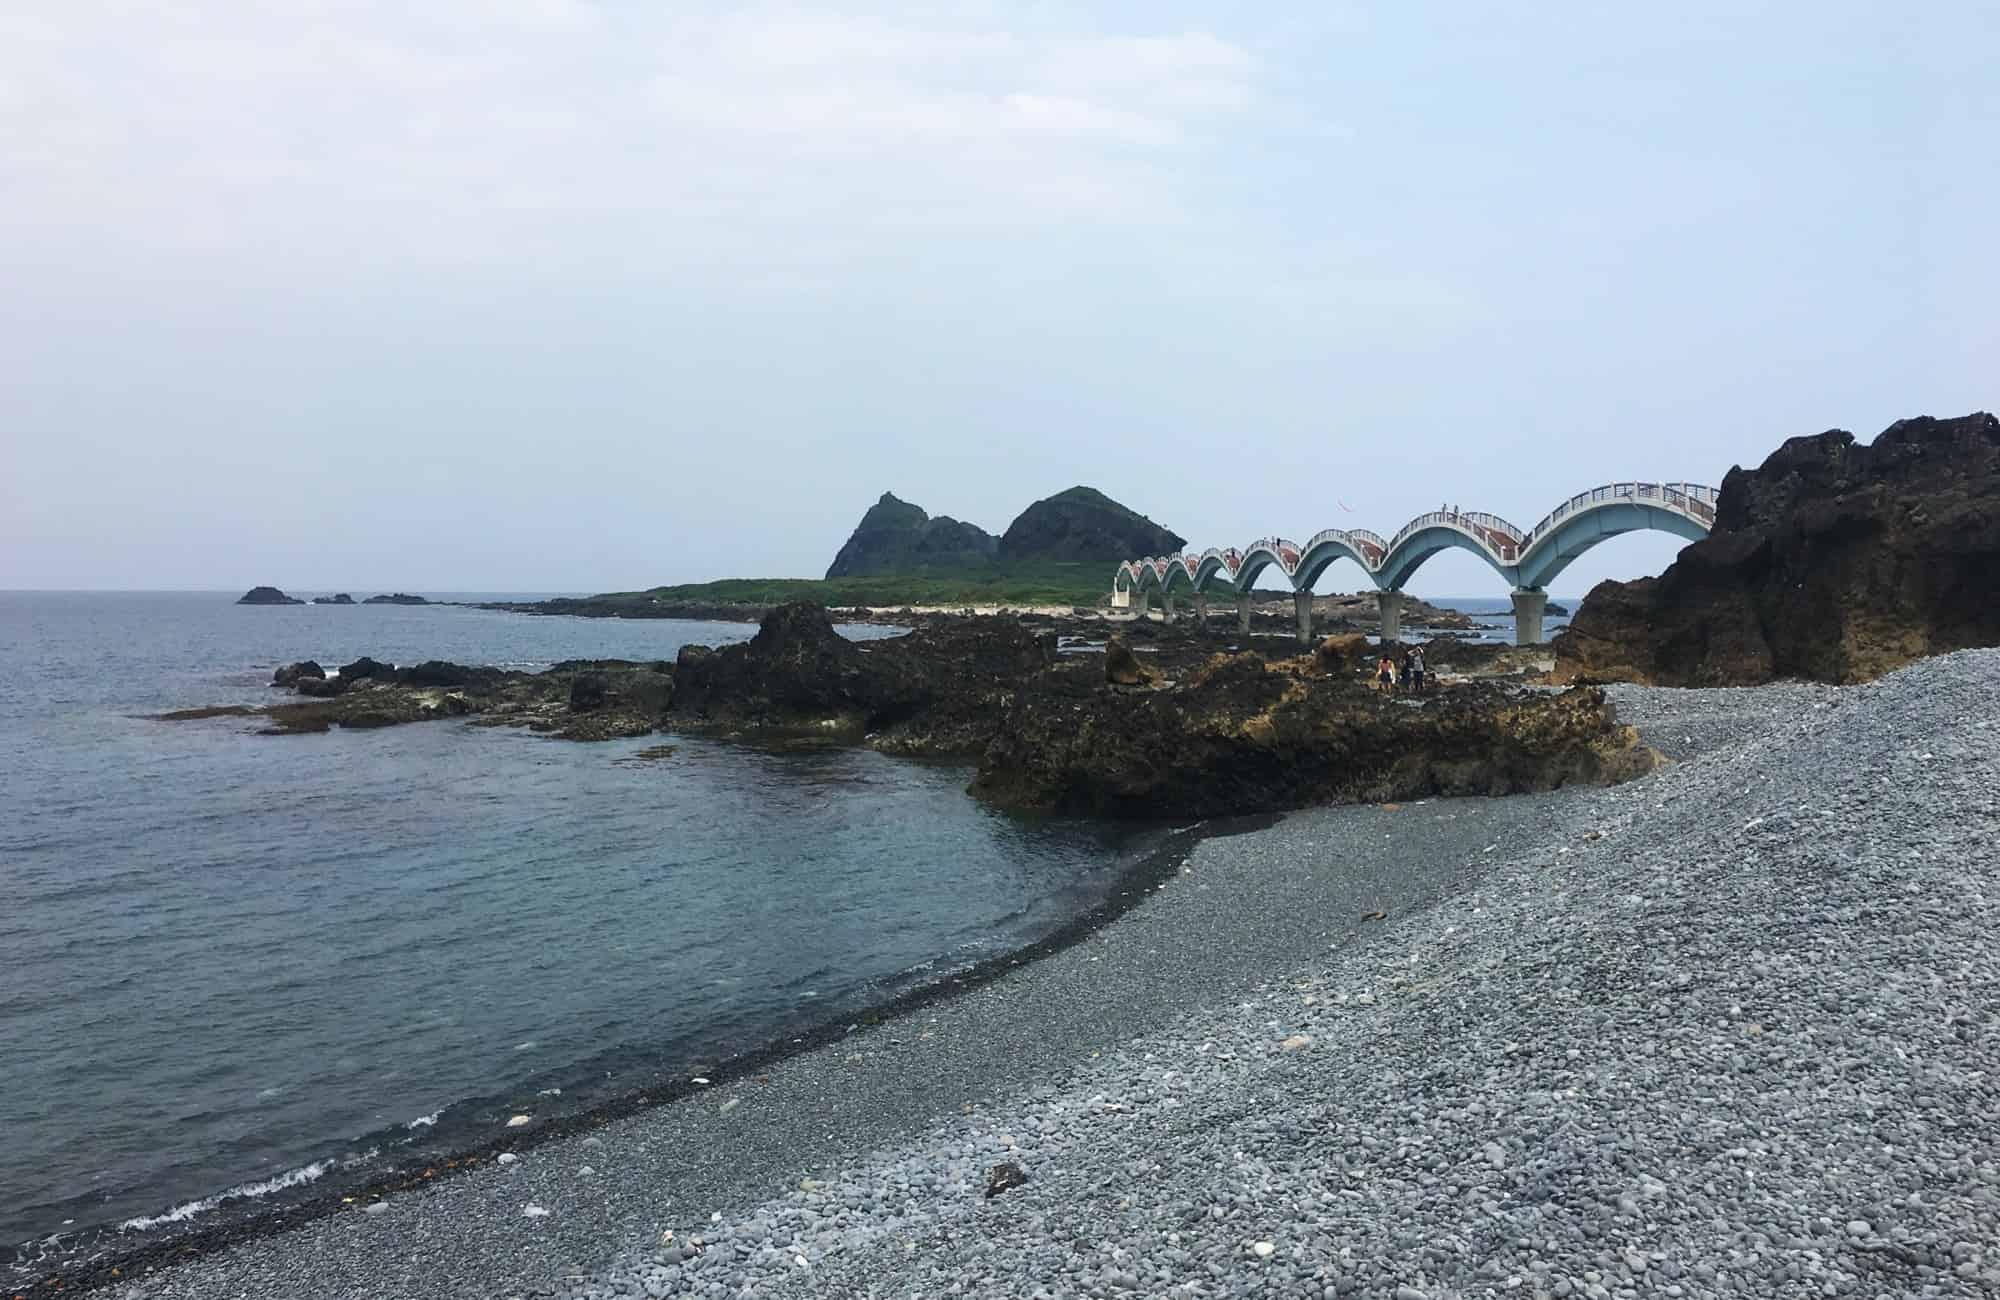 Voyage à Taïwan - Sanxiantai - Amplitudes